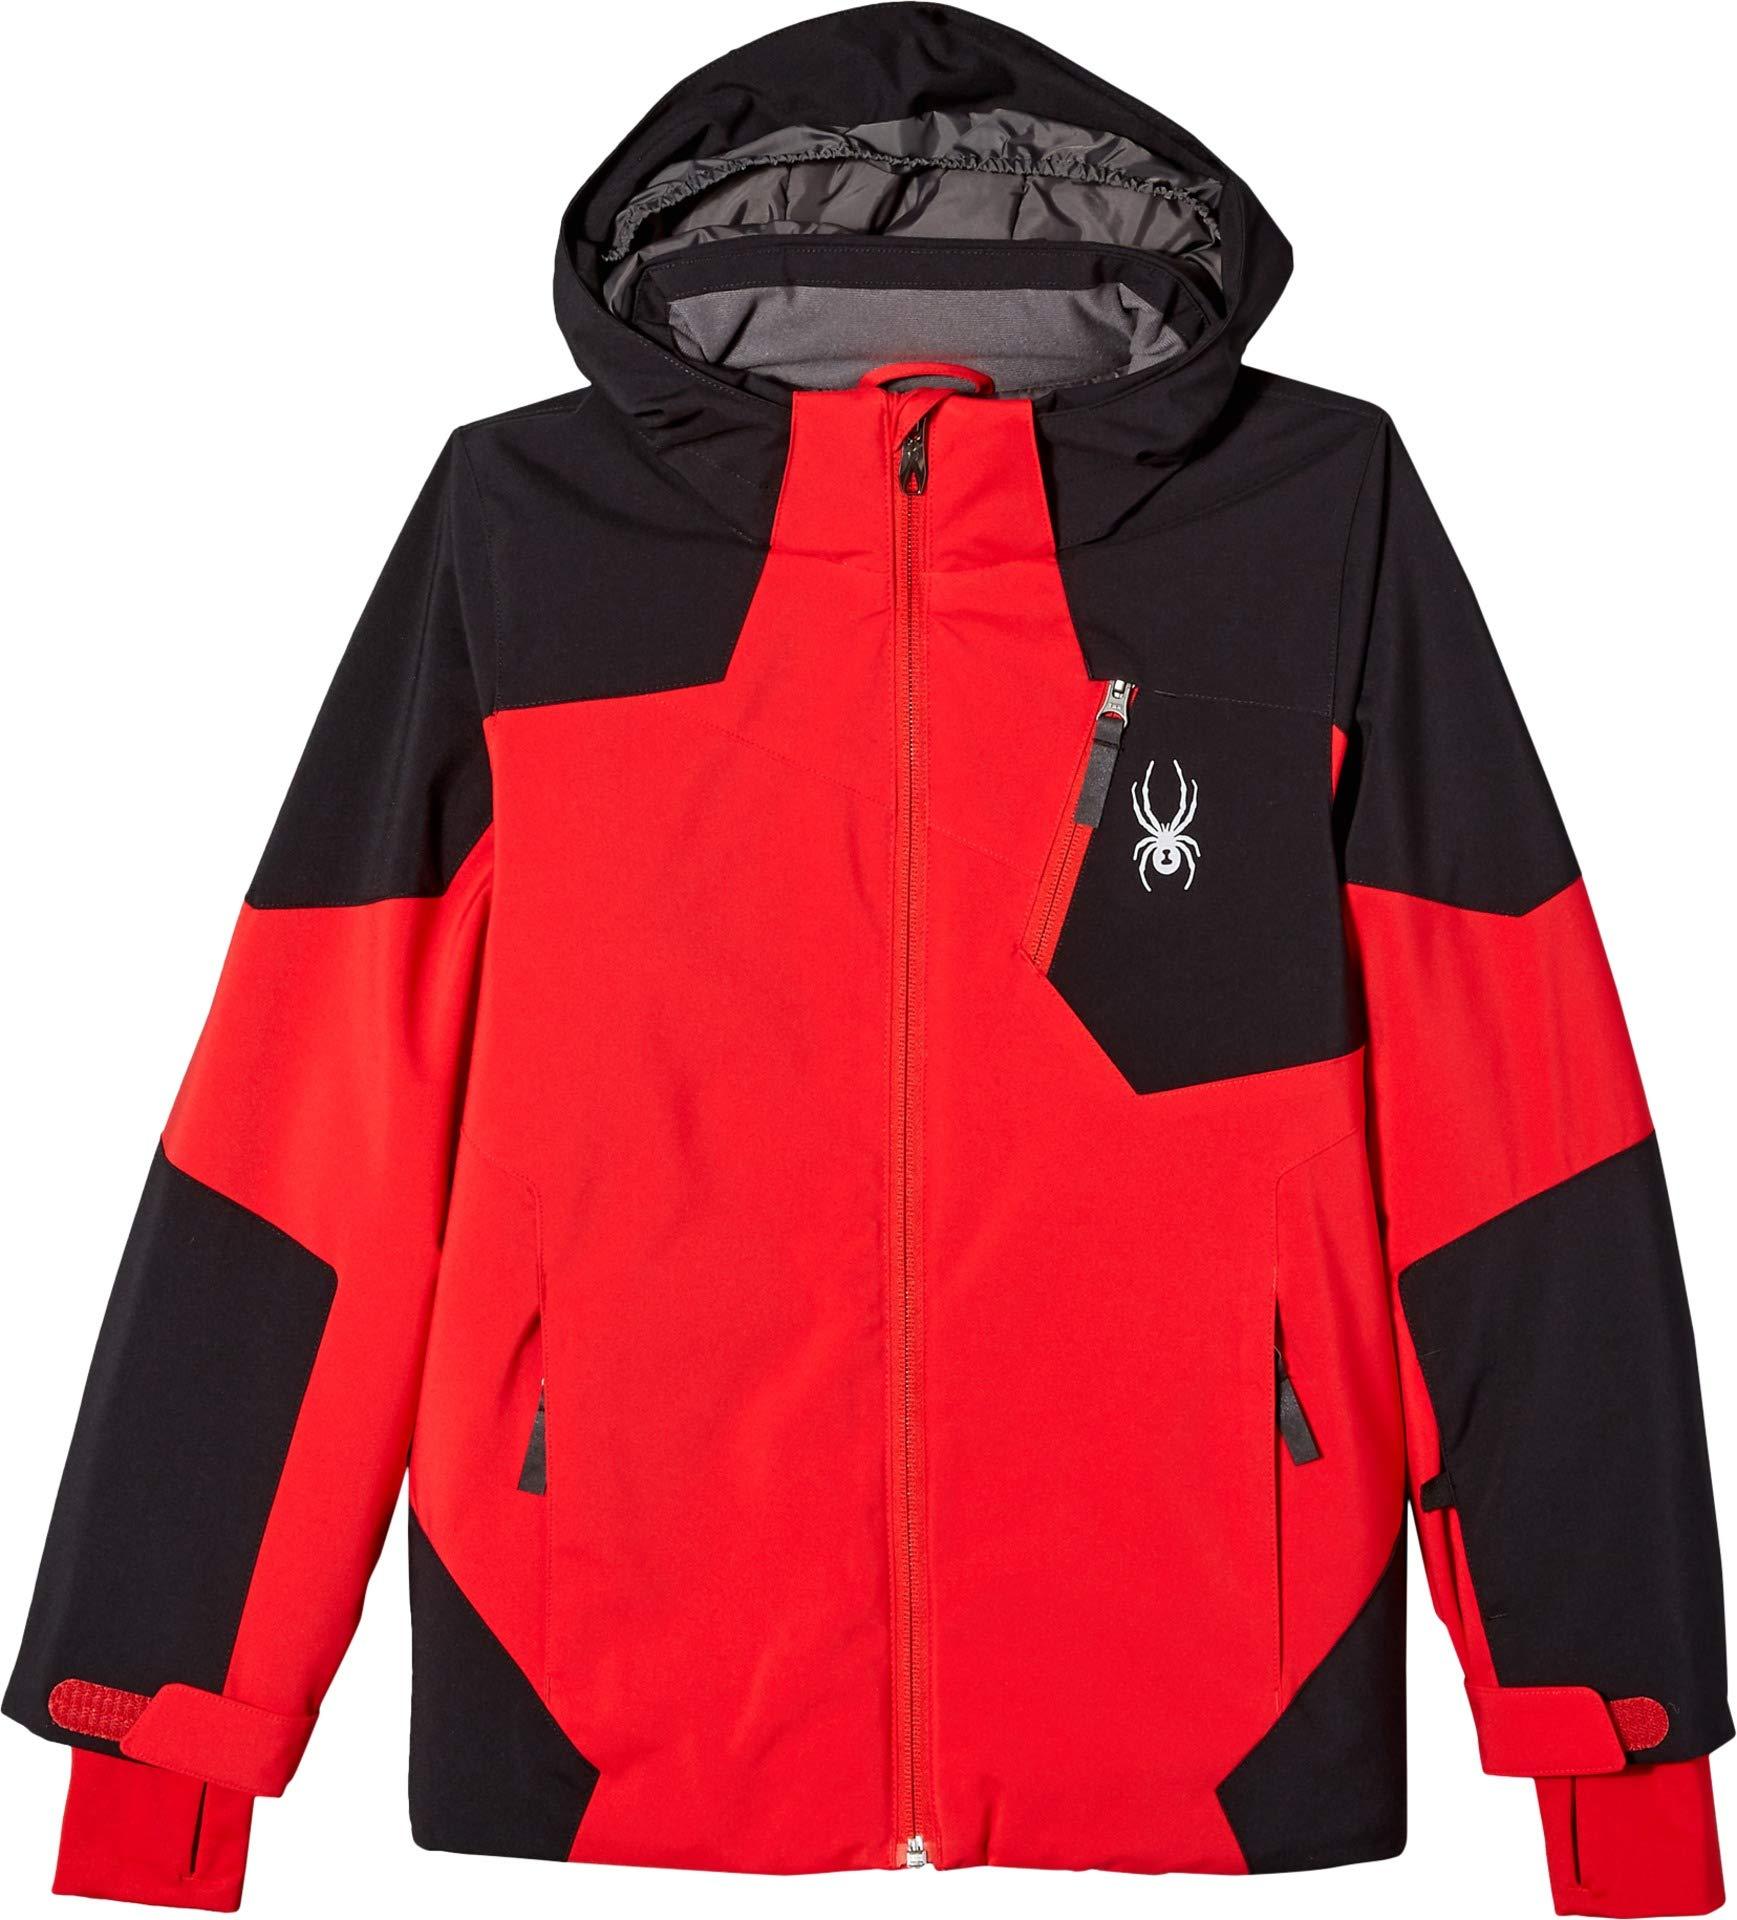 Spyder Boys' Chambers Ski Jacket, Red/Black/Red, Size 8